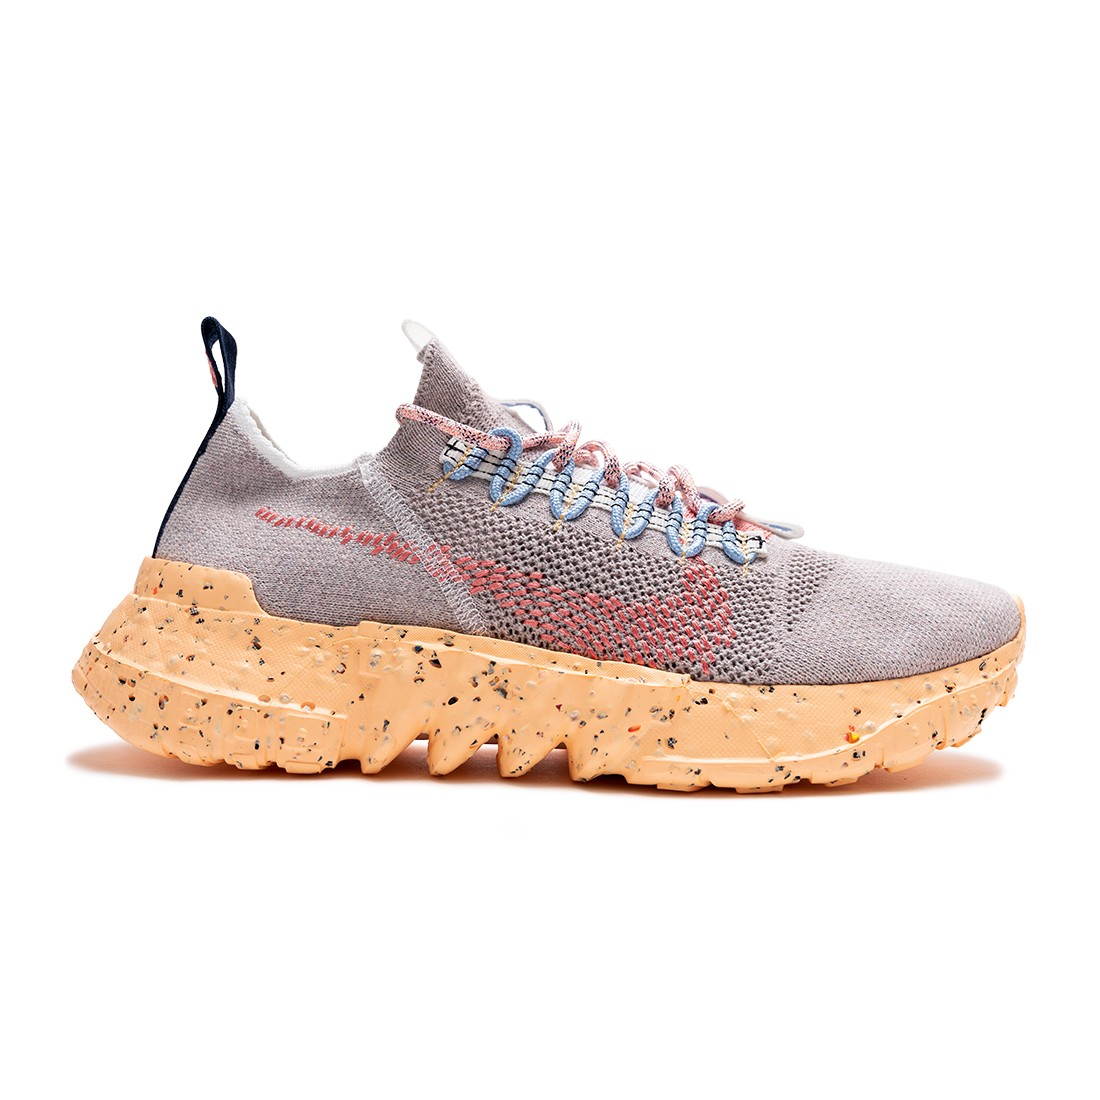 Nike Men Space Hippie 01 (vast grey / summit white-melon tint)